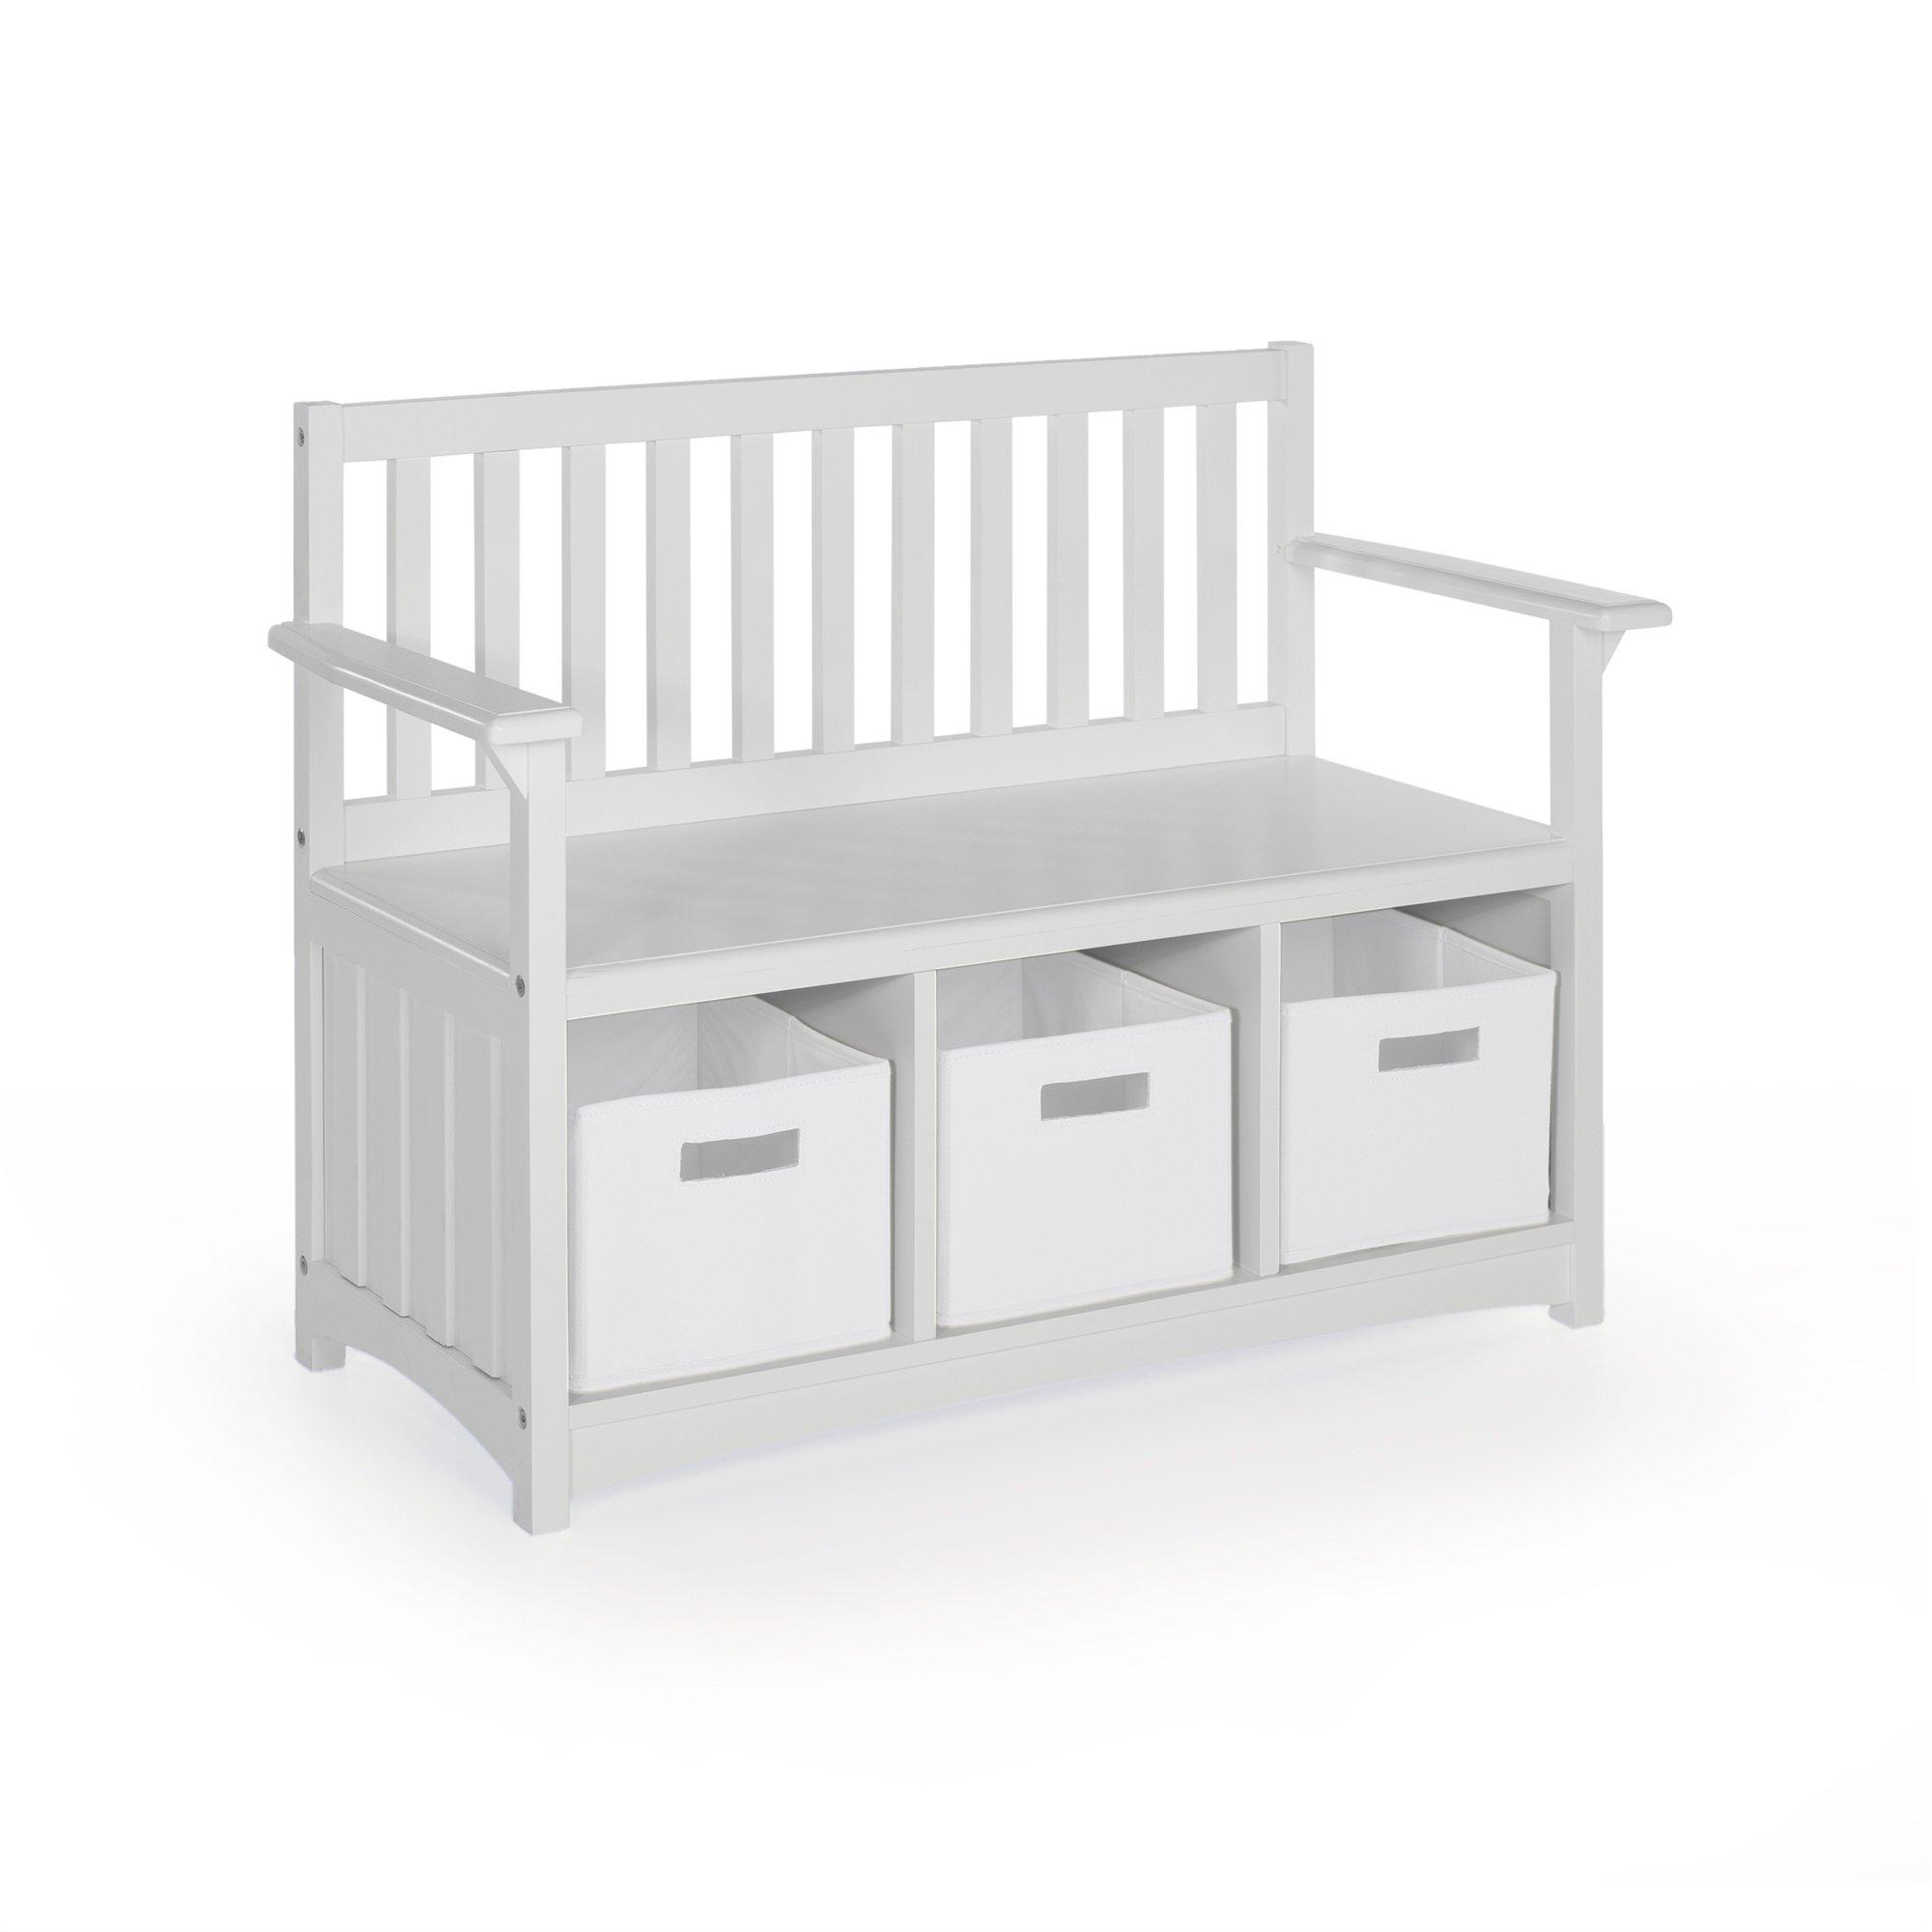 Guidecraft Classic Storage Bench with Bins - Gray: Bins Storage Cubby, Kids Toys Organizer, School Educational Supply Furniture